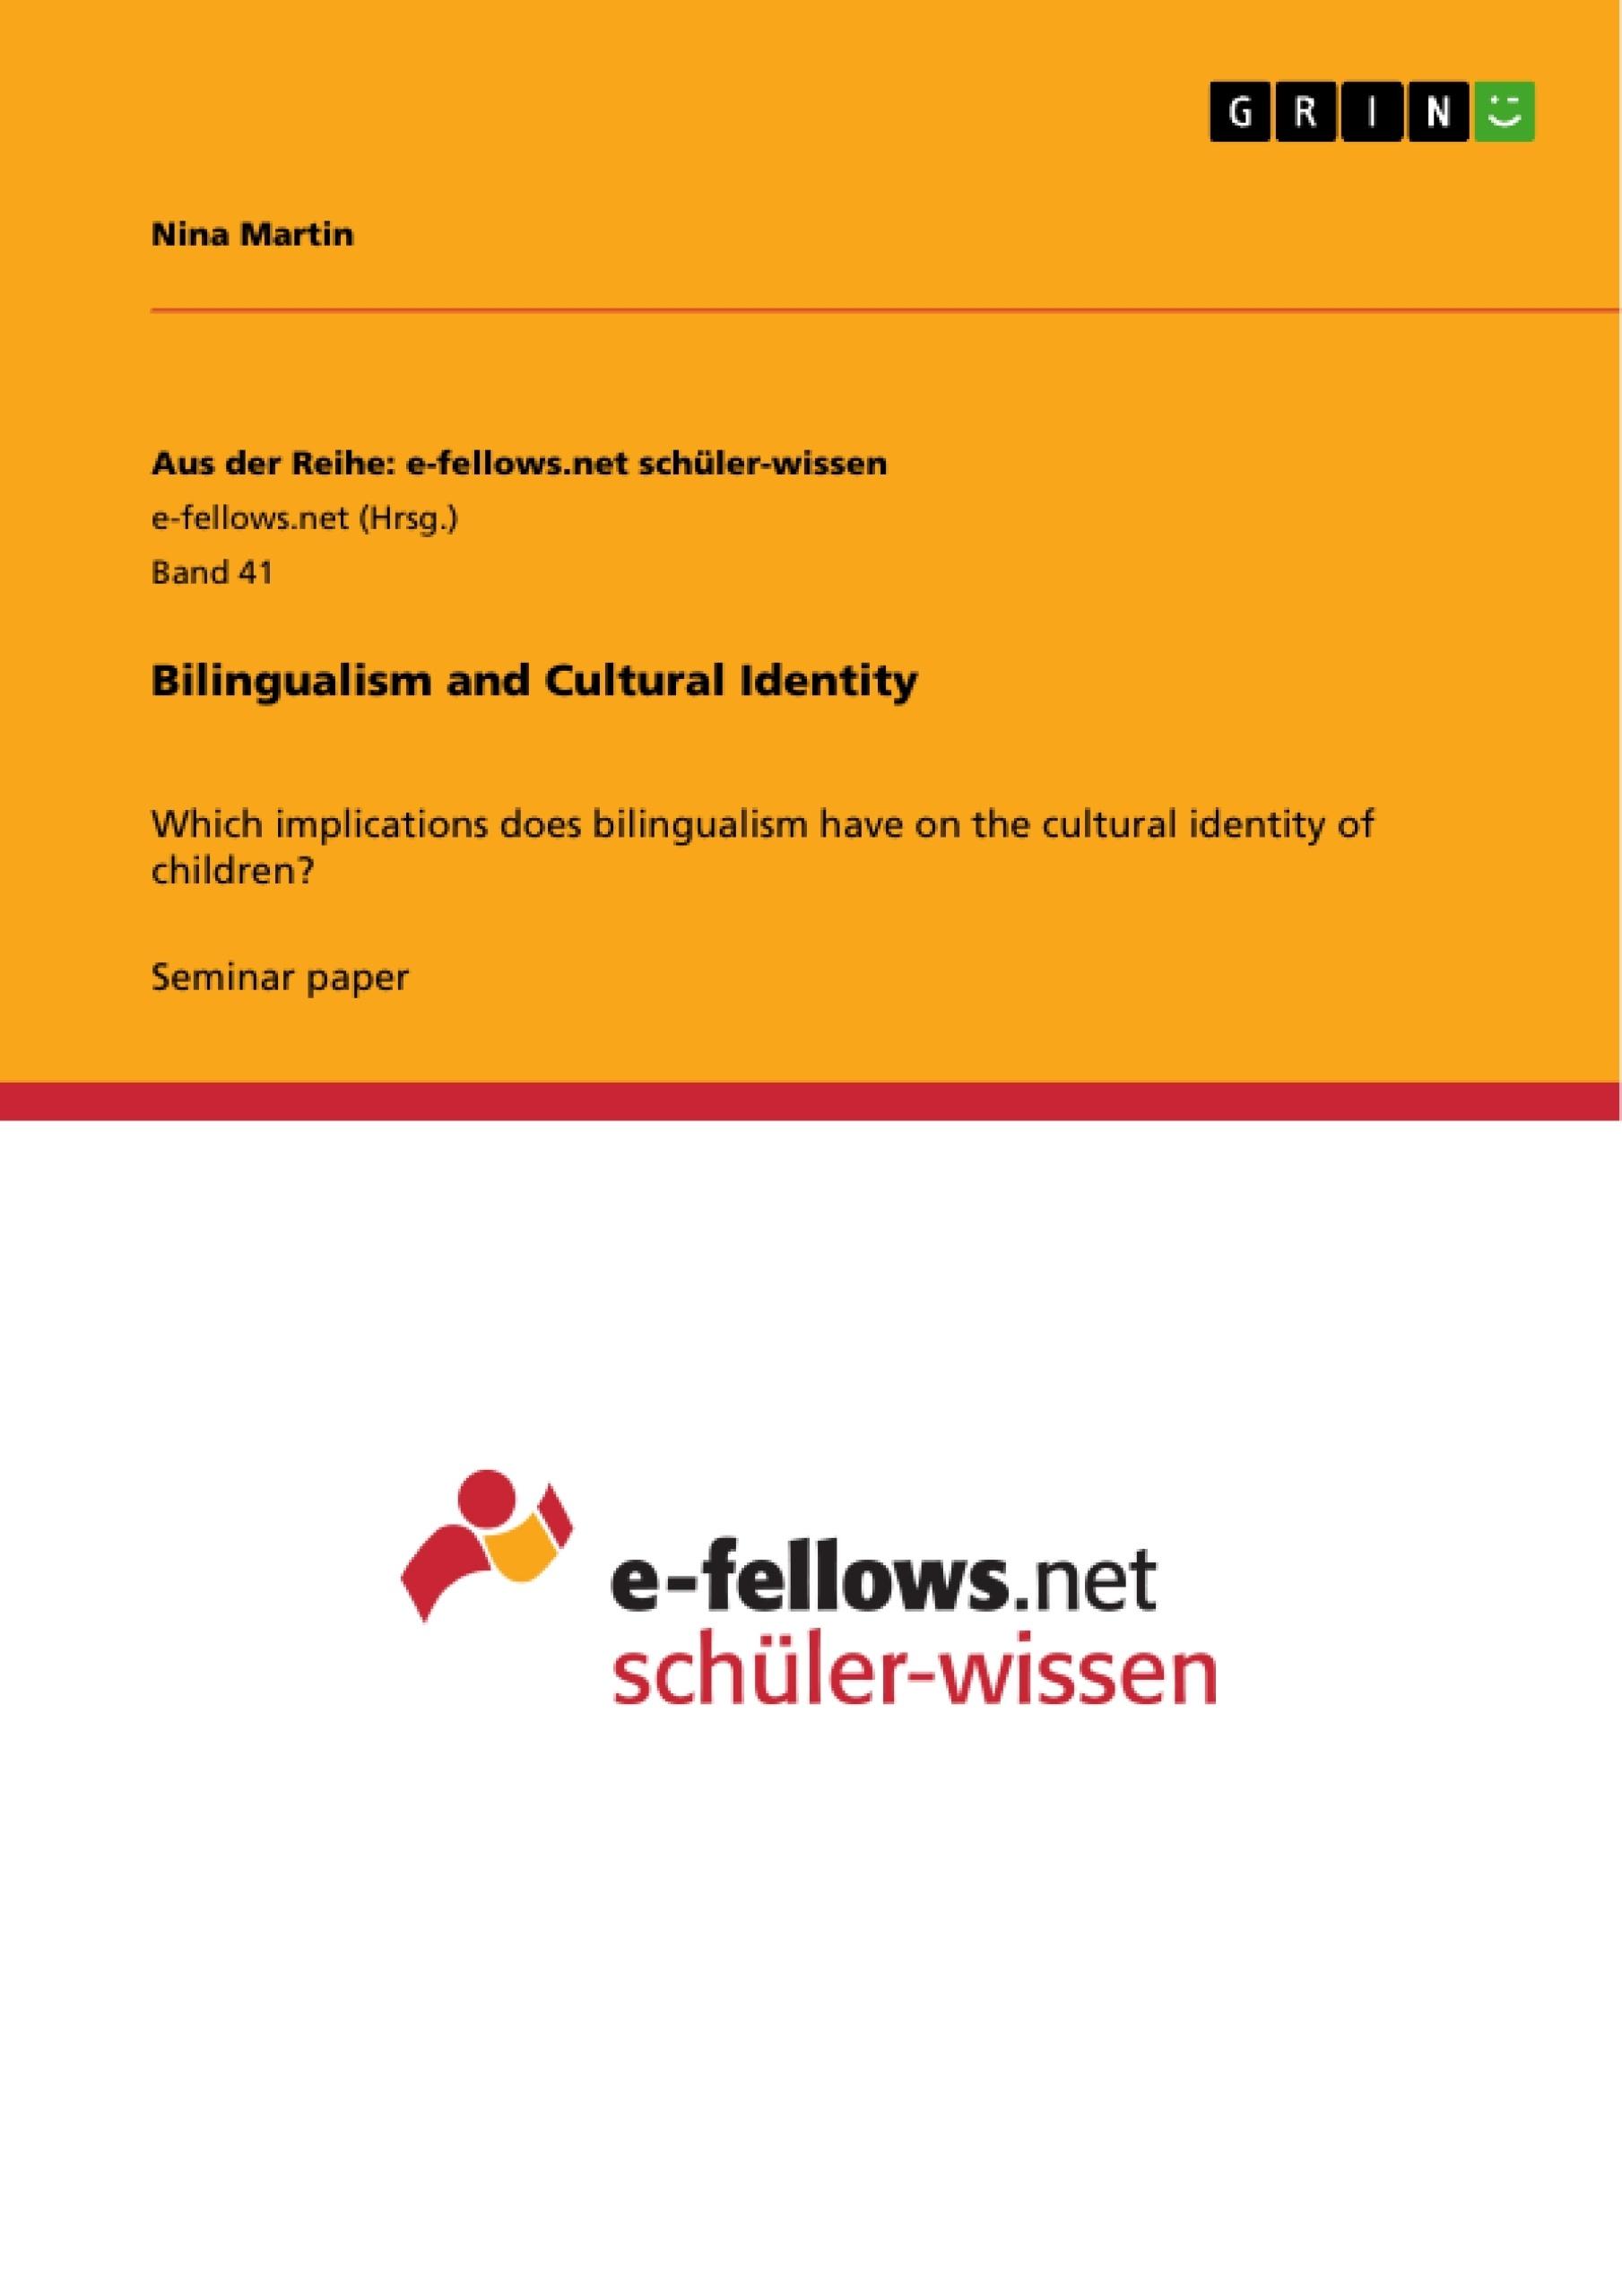 advantages bilingual education essay Bilingual education cognitive, and cultural advantages that accrue to individuals and this example history of bilingual education essay is published for.